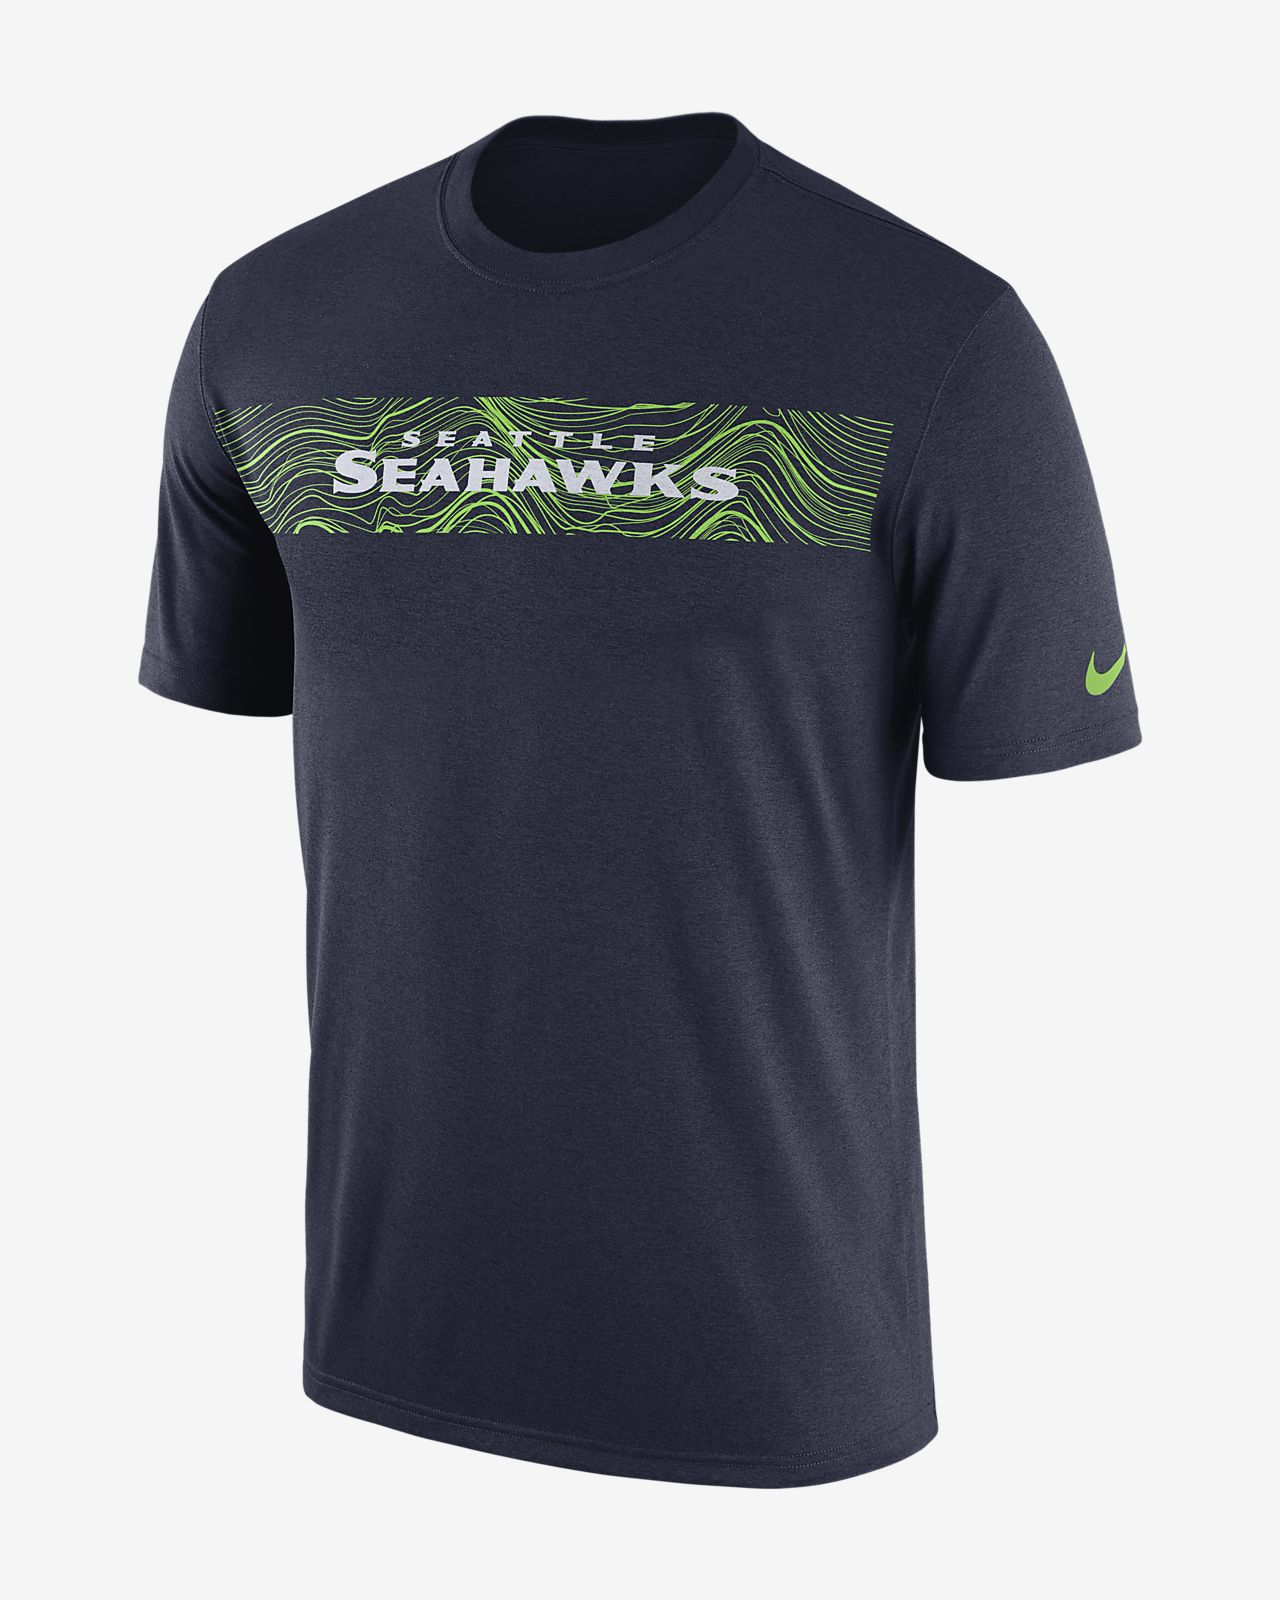 1e374ef3e23b2 Playera para hombre Nike Dri-FIT Legend Seismic (NFL Seahawks). Nike ...